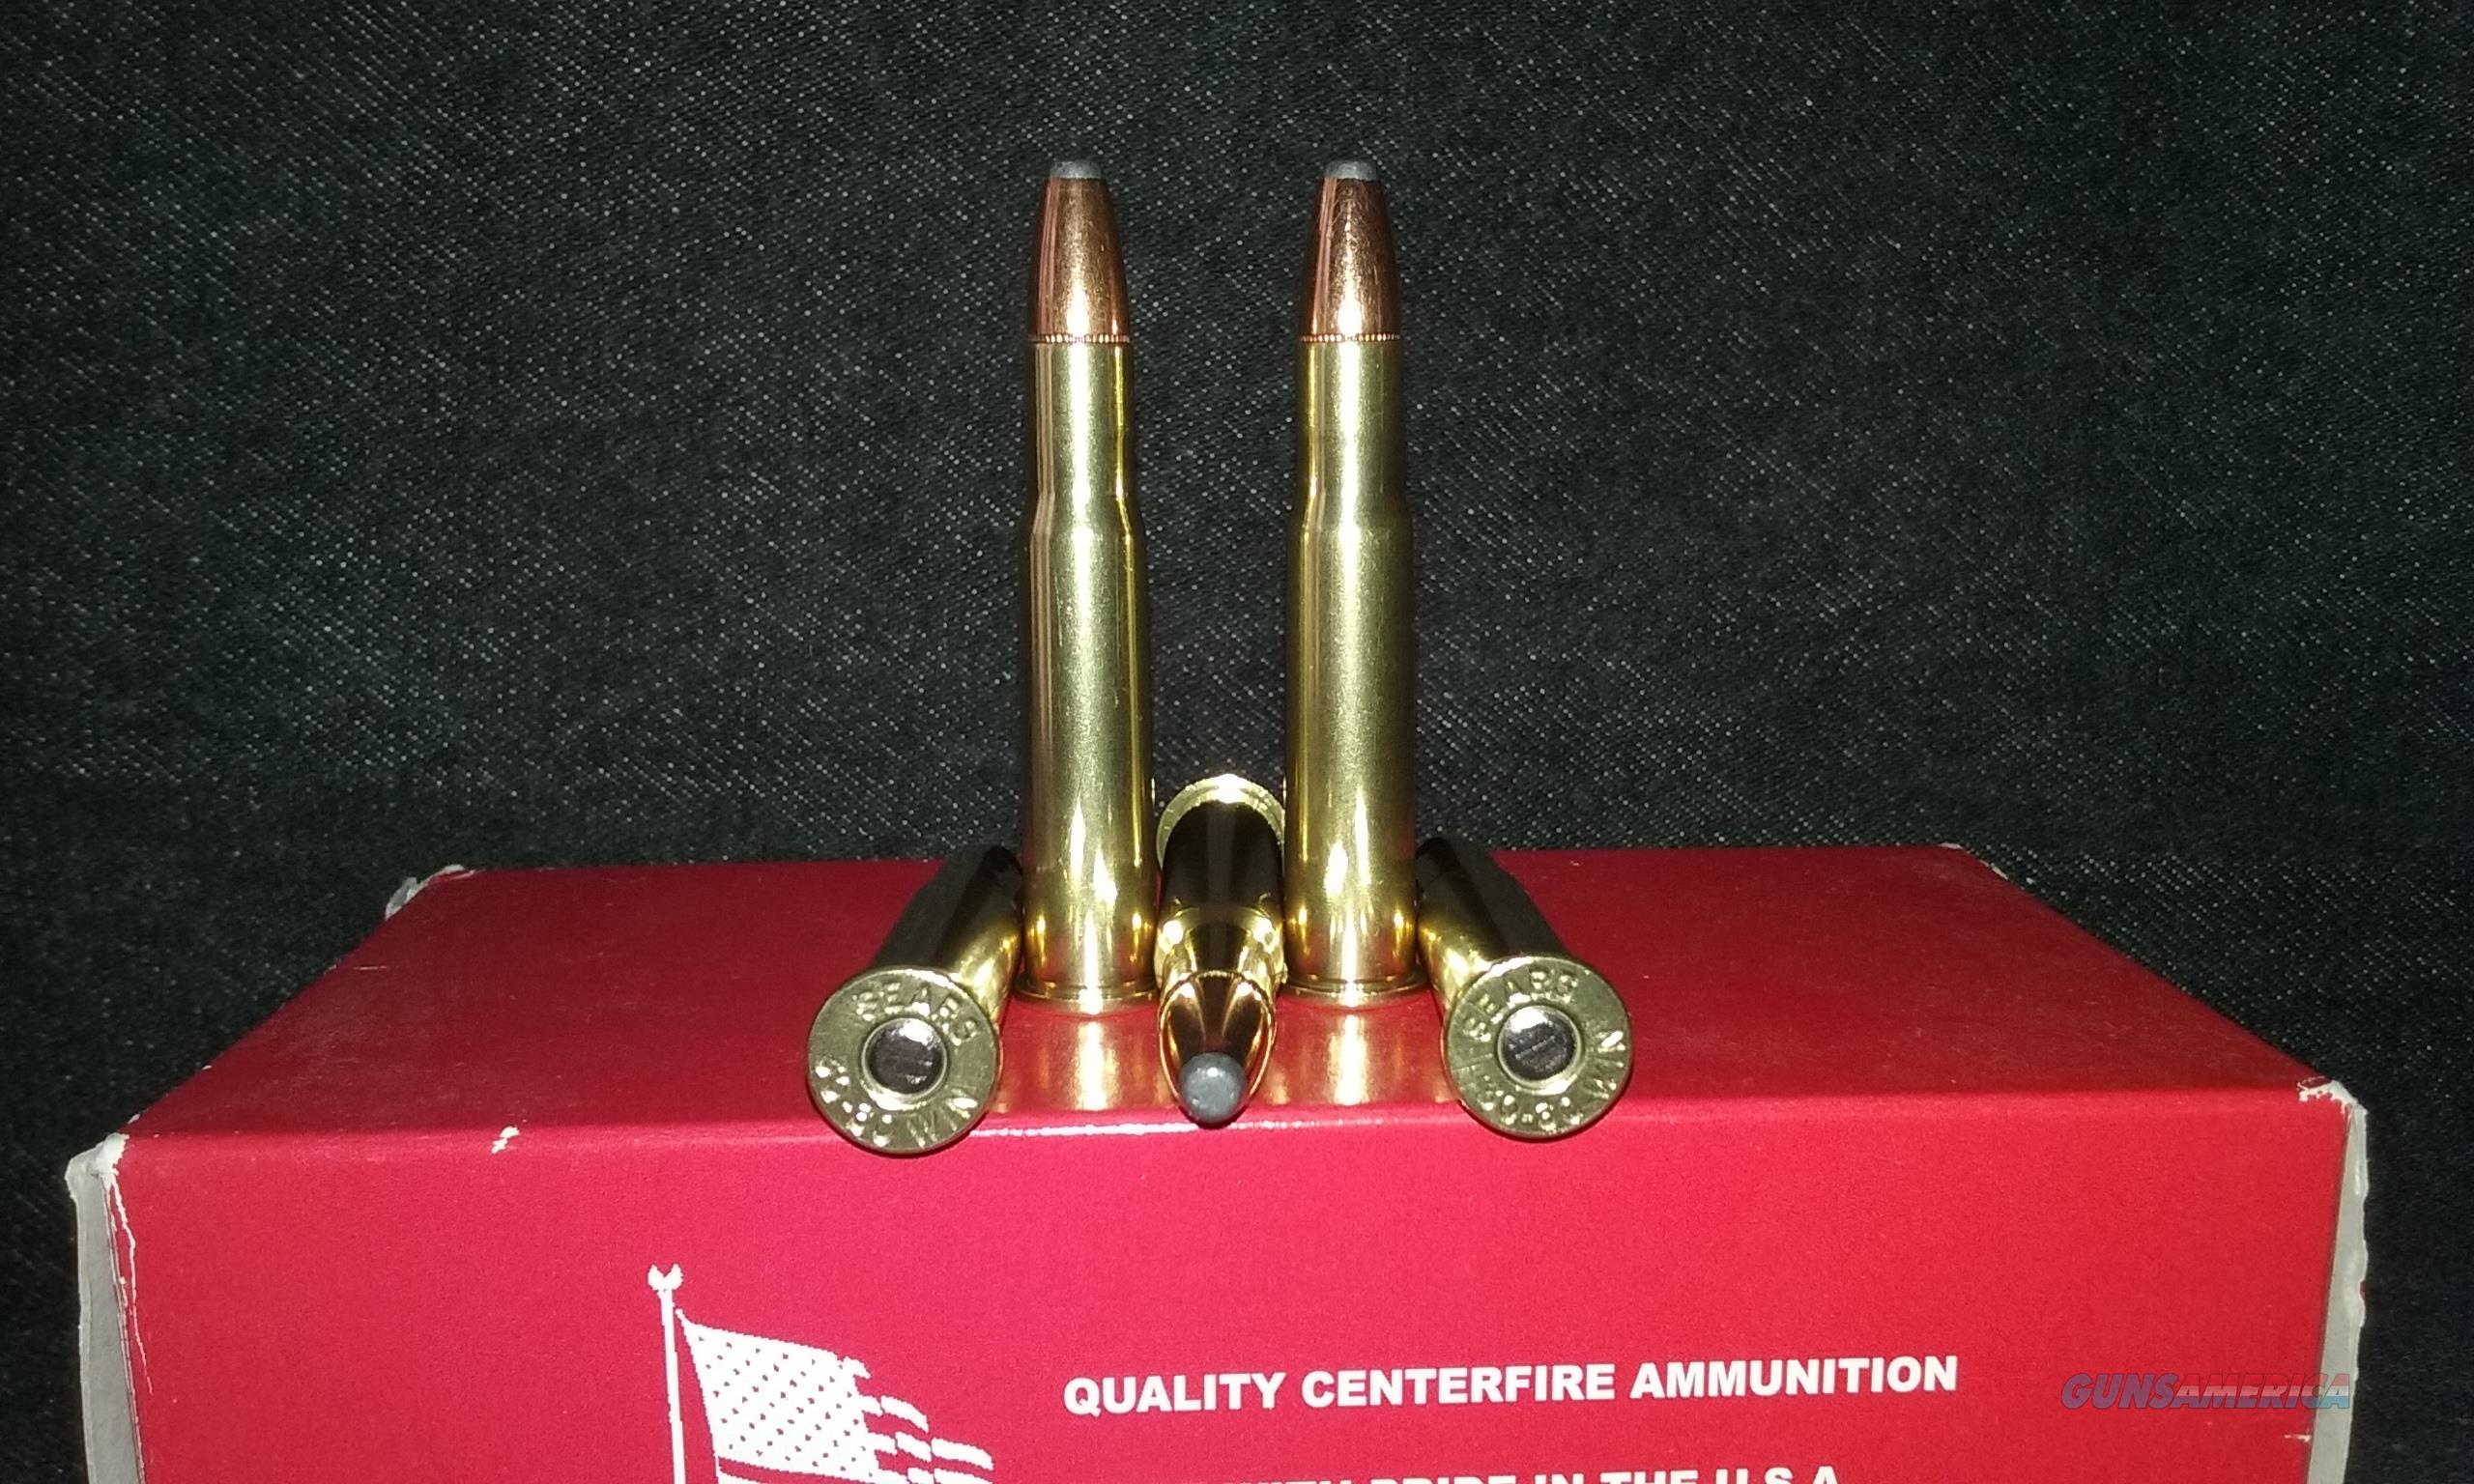 30-30 Winchester Ammo.  Non-Guns > Ammunition